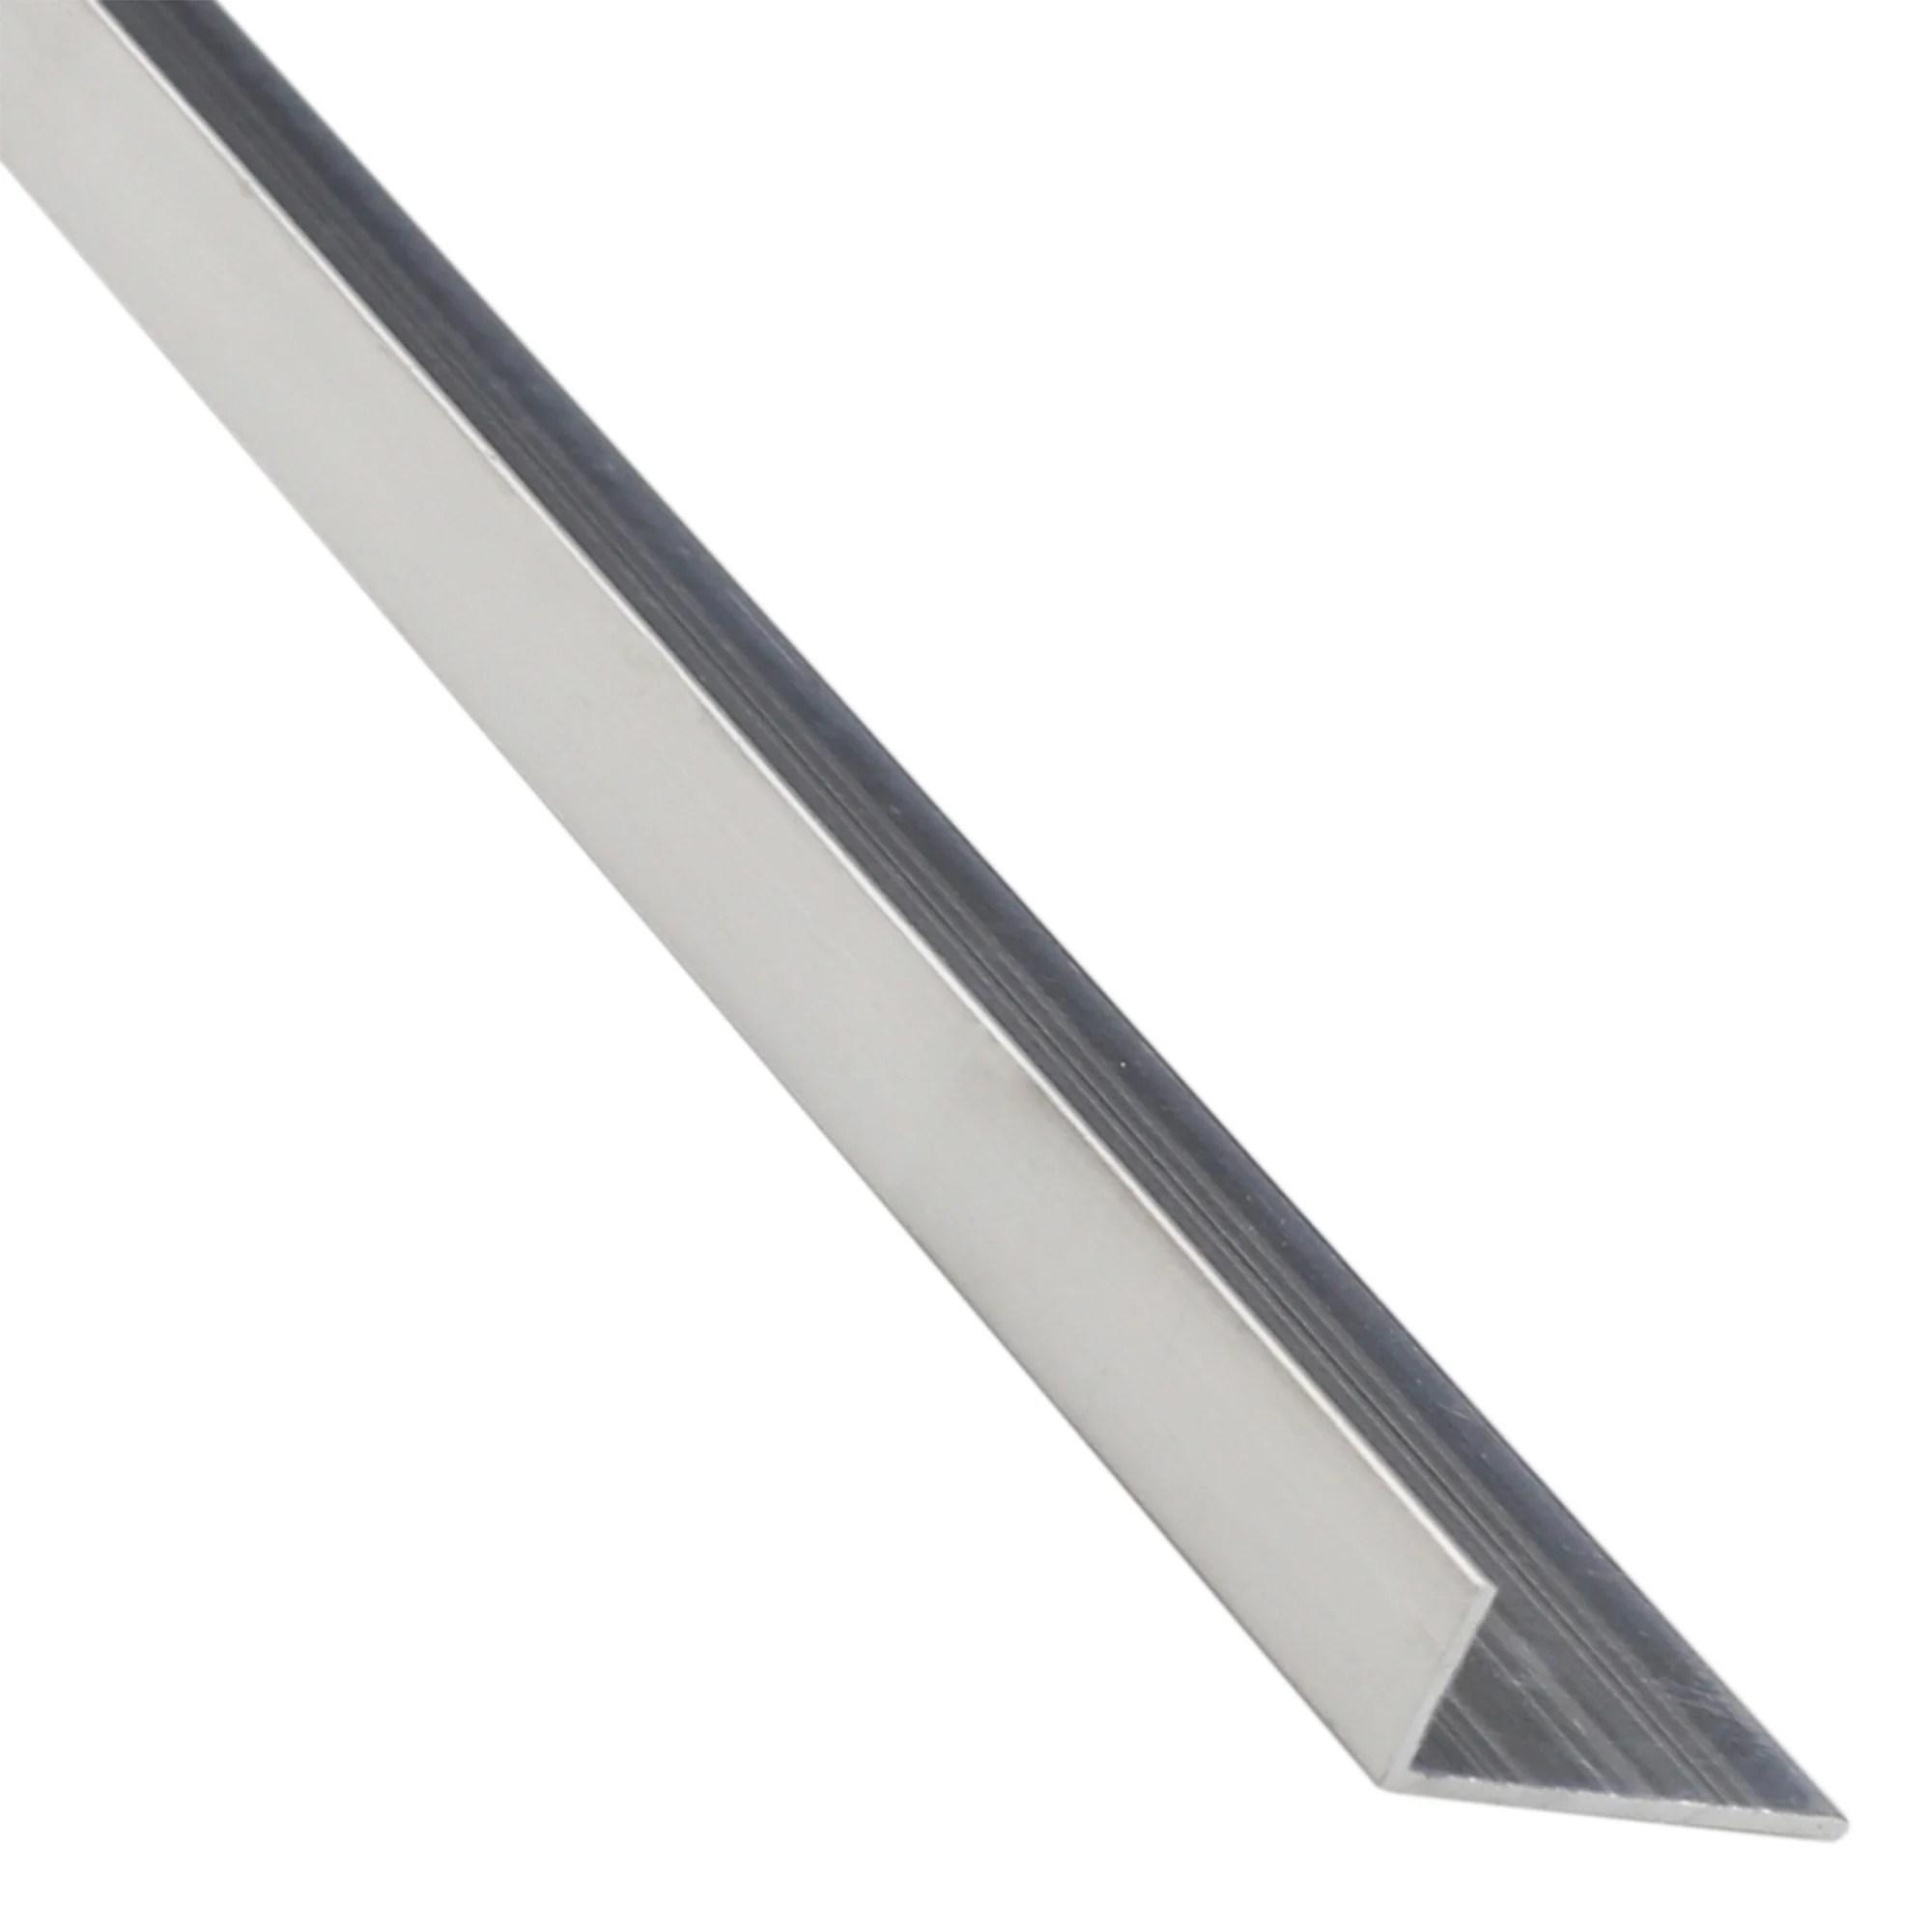 Corniere Inegale Aluminium Brut Gris L 2 6 M X L 1 95 Cm X H 1 15 Cm Leroy Merlin